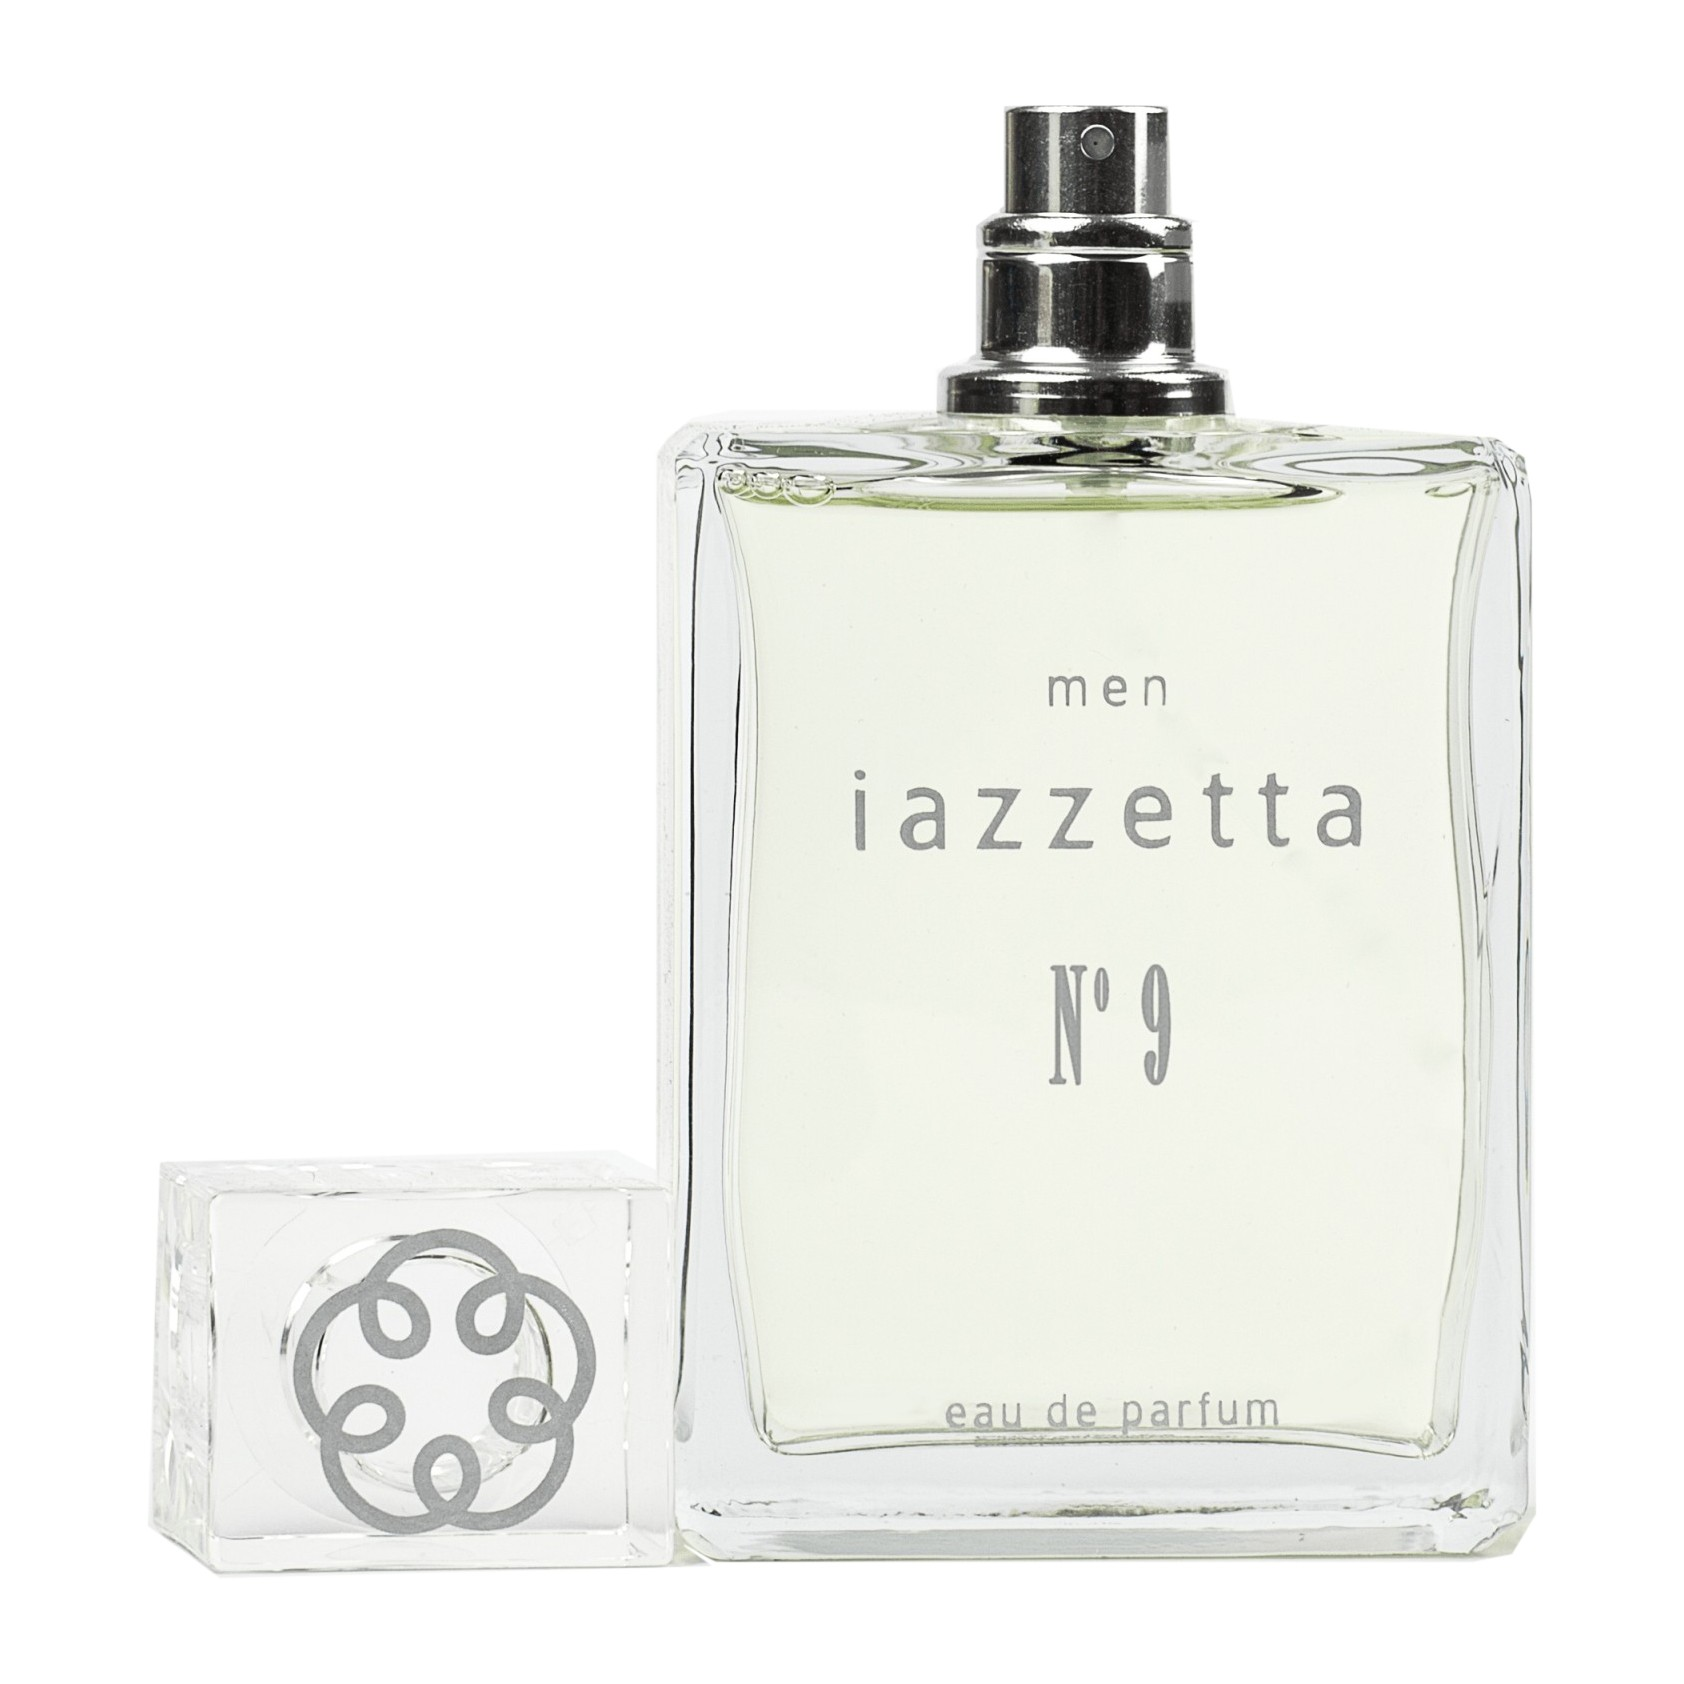 Gabriele Lazzetta Lazzetta N° 9 аромат для мужчин